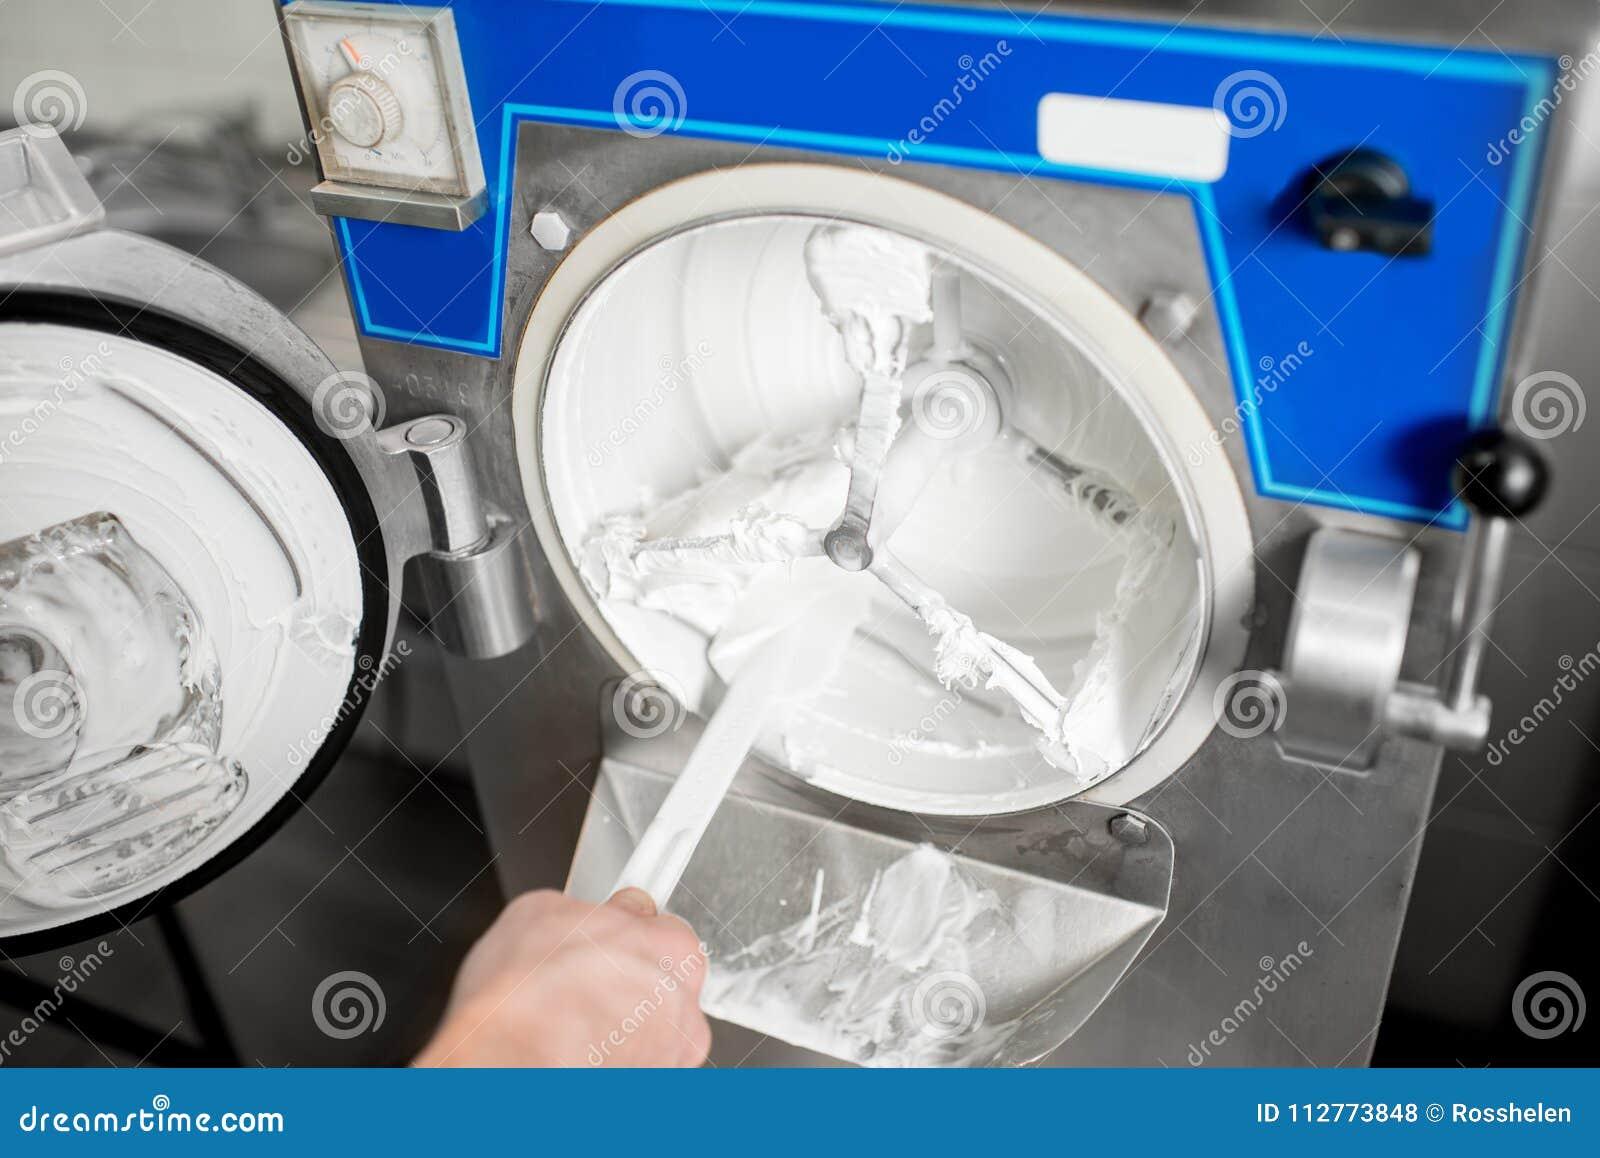 Cleaning Ice Cream Maker Machine Stock Photo Image Of Closeup Technology 112773848